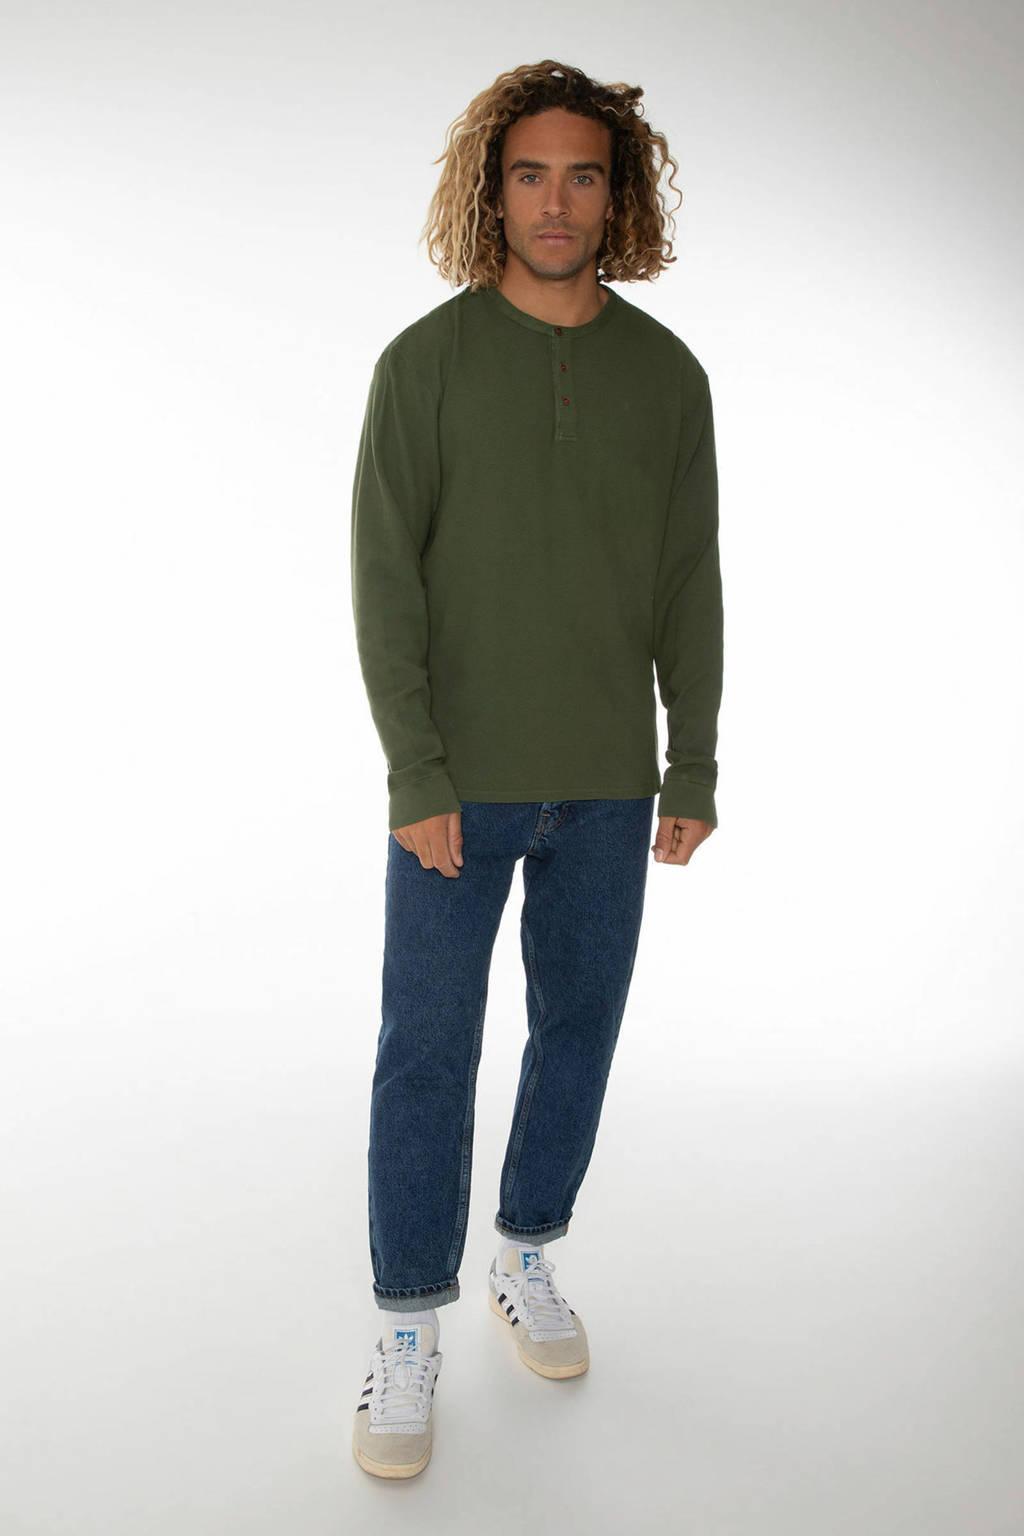 NXG by Protest sweater Promise donkergroen, Donkergroen